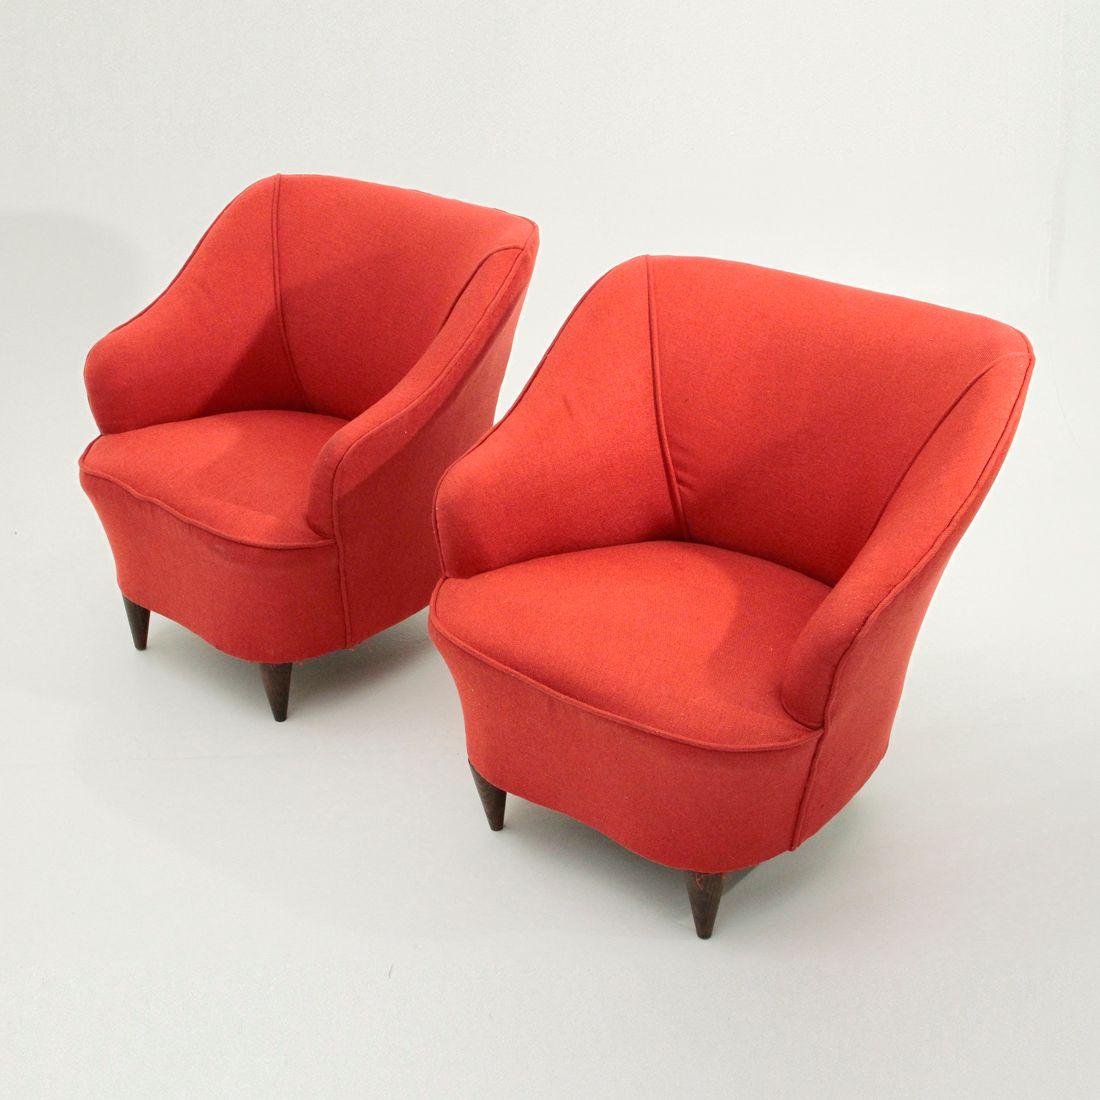 Rote italienische sessel 1940er 2er set bei pamono kaufen for Sessel italienisches design